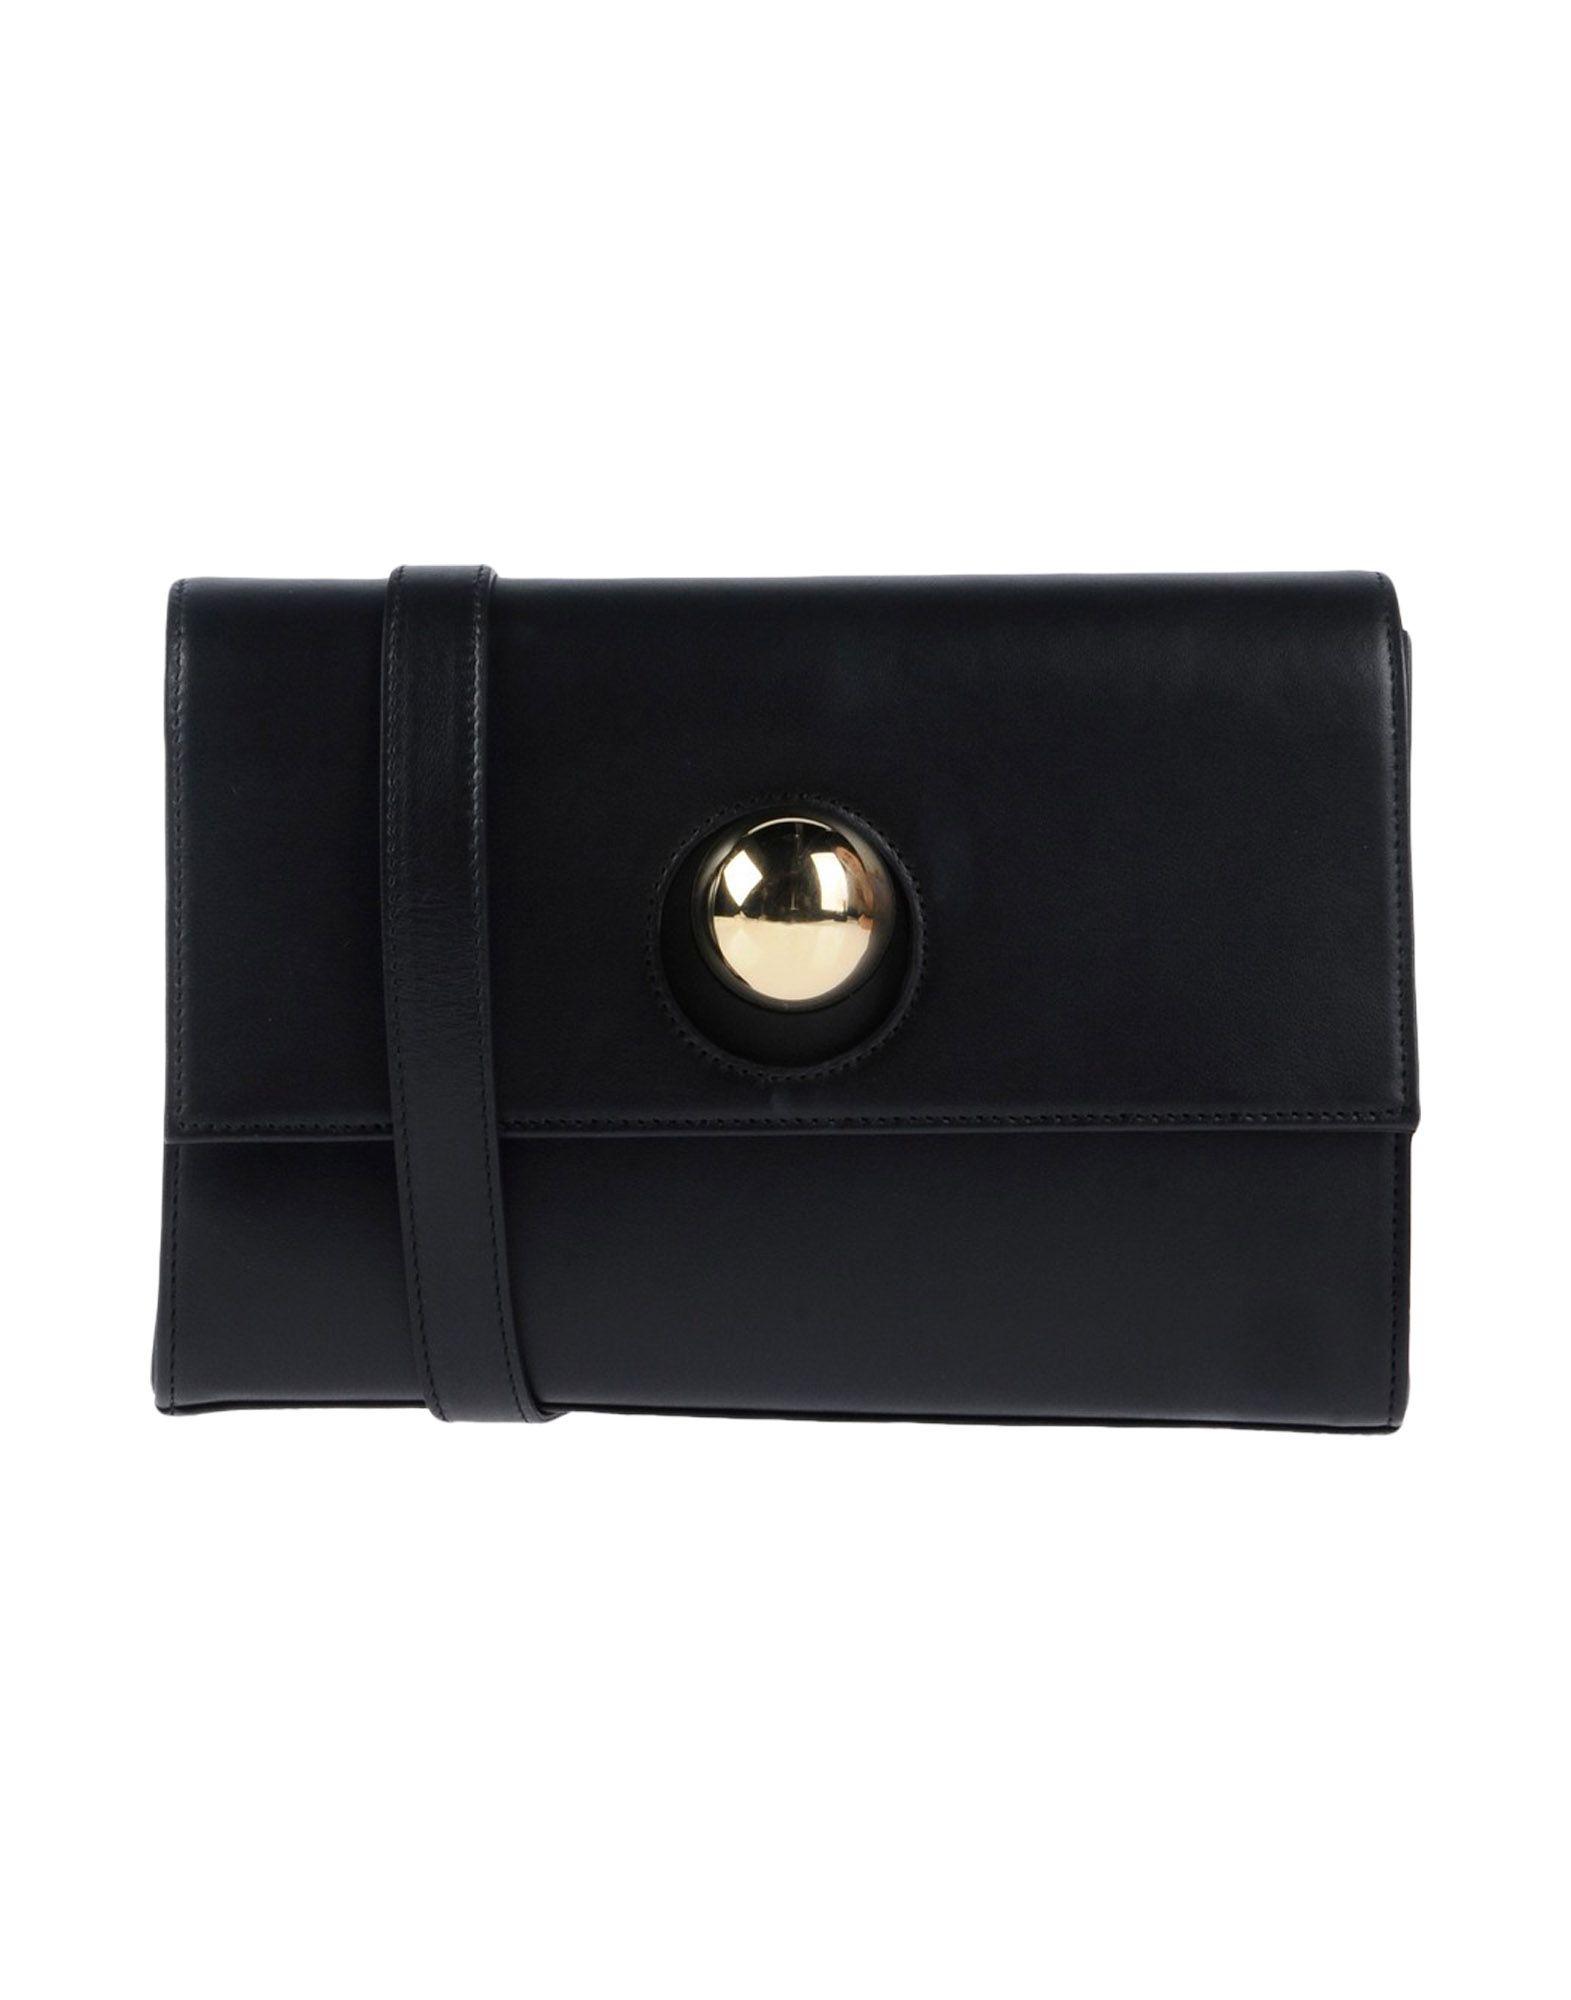 SAVAS Handbag in Black